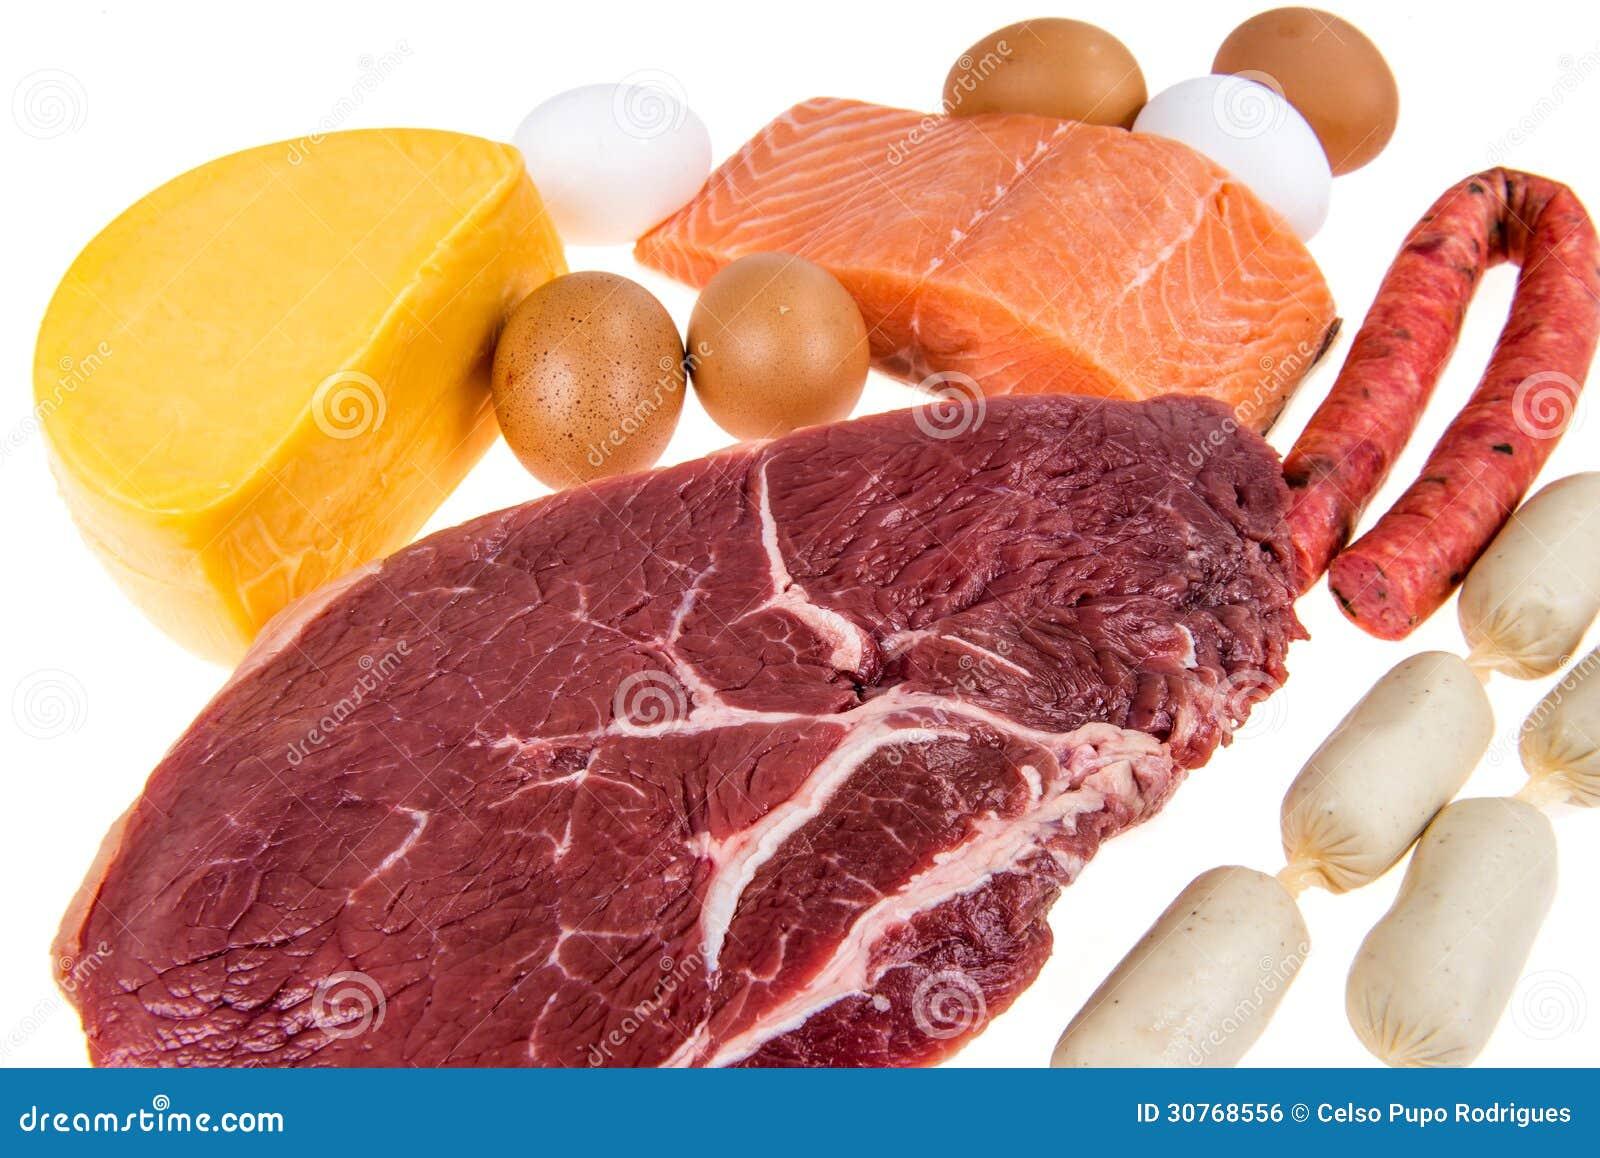 Low Phe Foods List